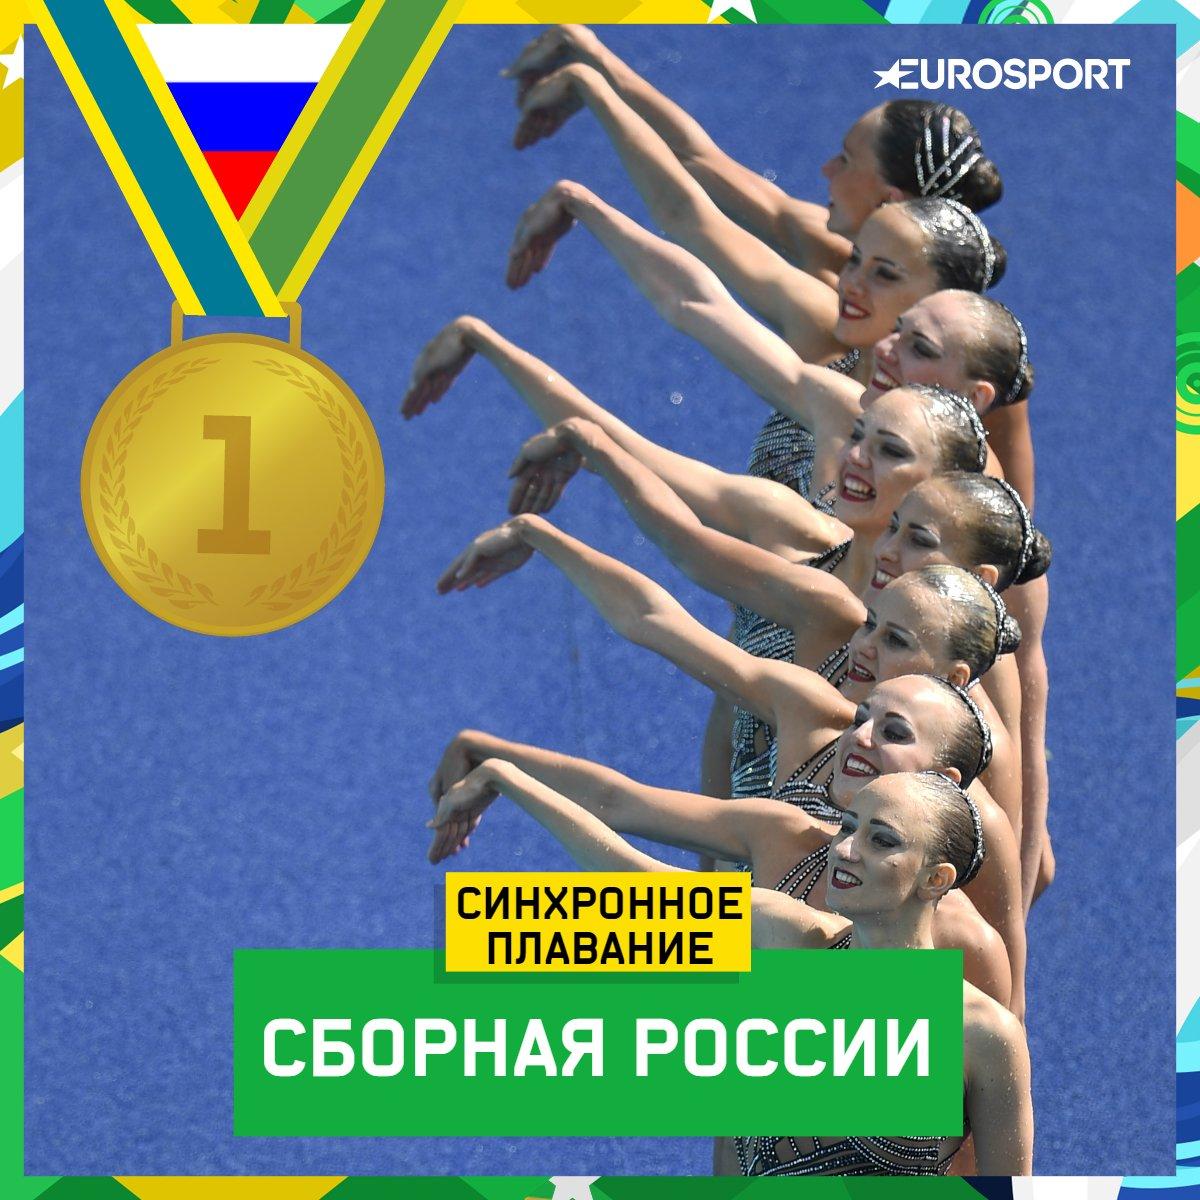 Олимпийские игры 2016-2 - Страница 9 CqO_kz-W8AEru4o